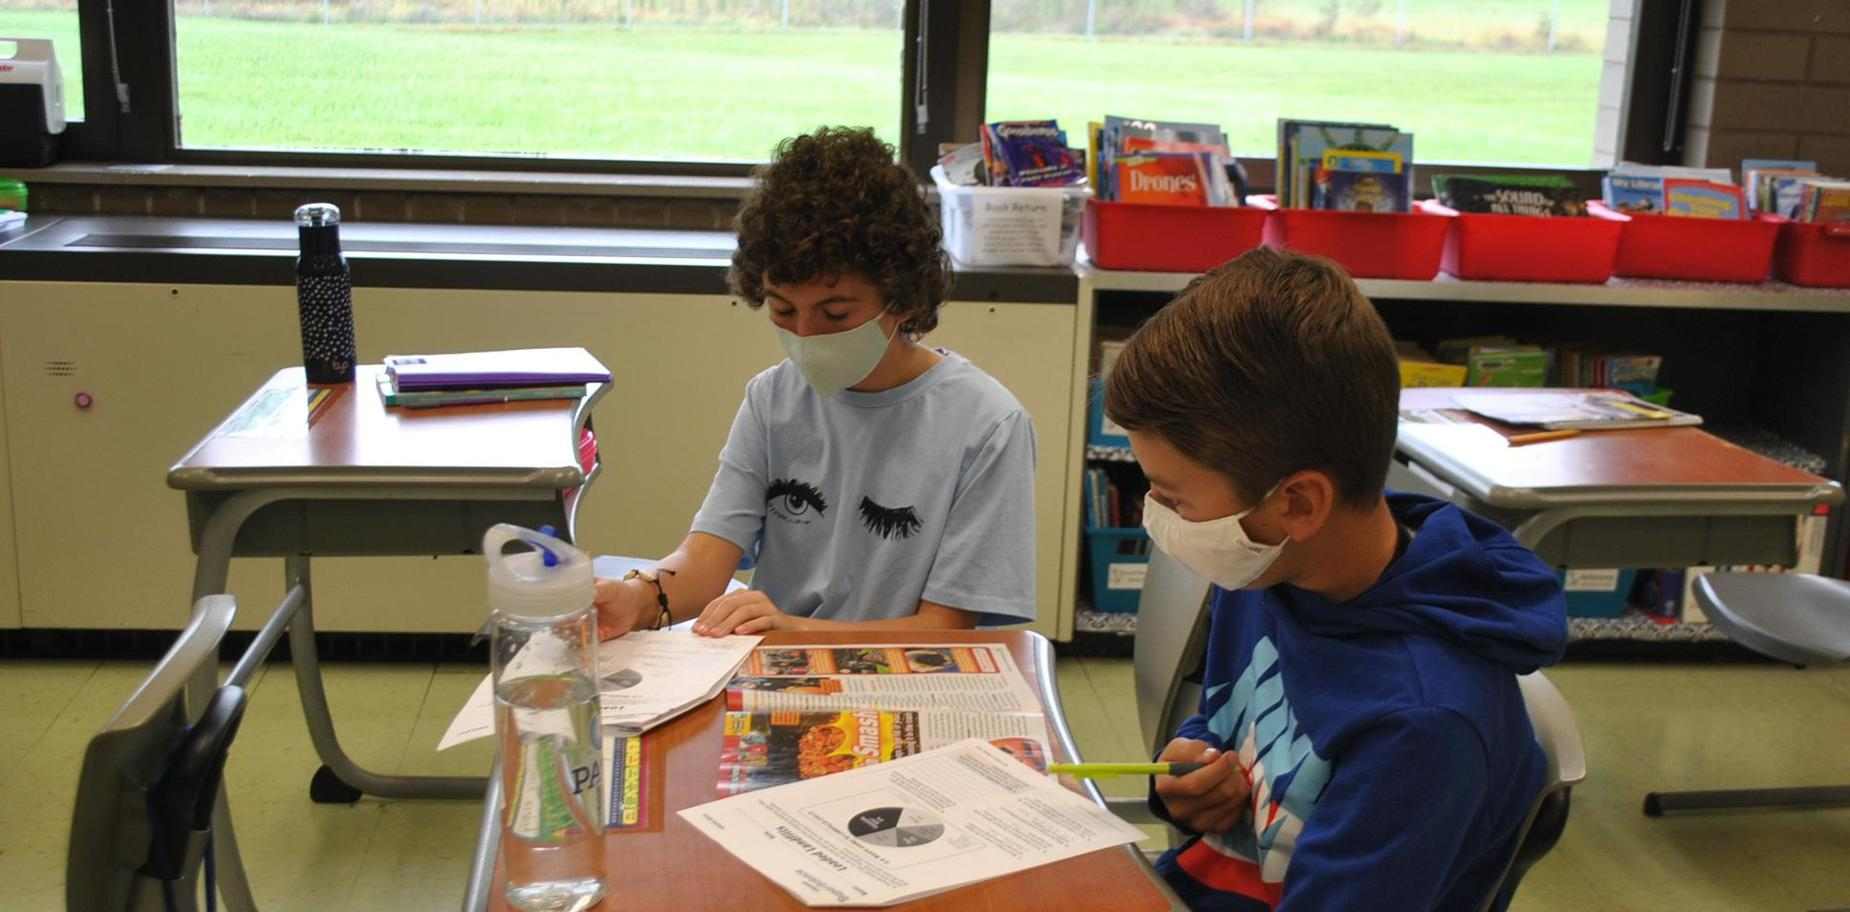 Students doing classwork